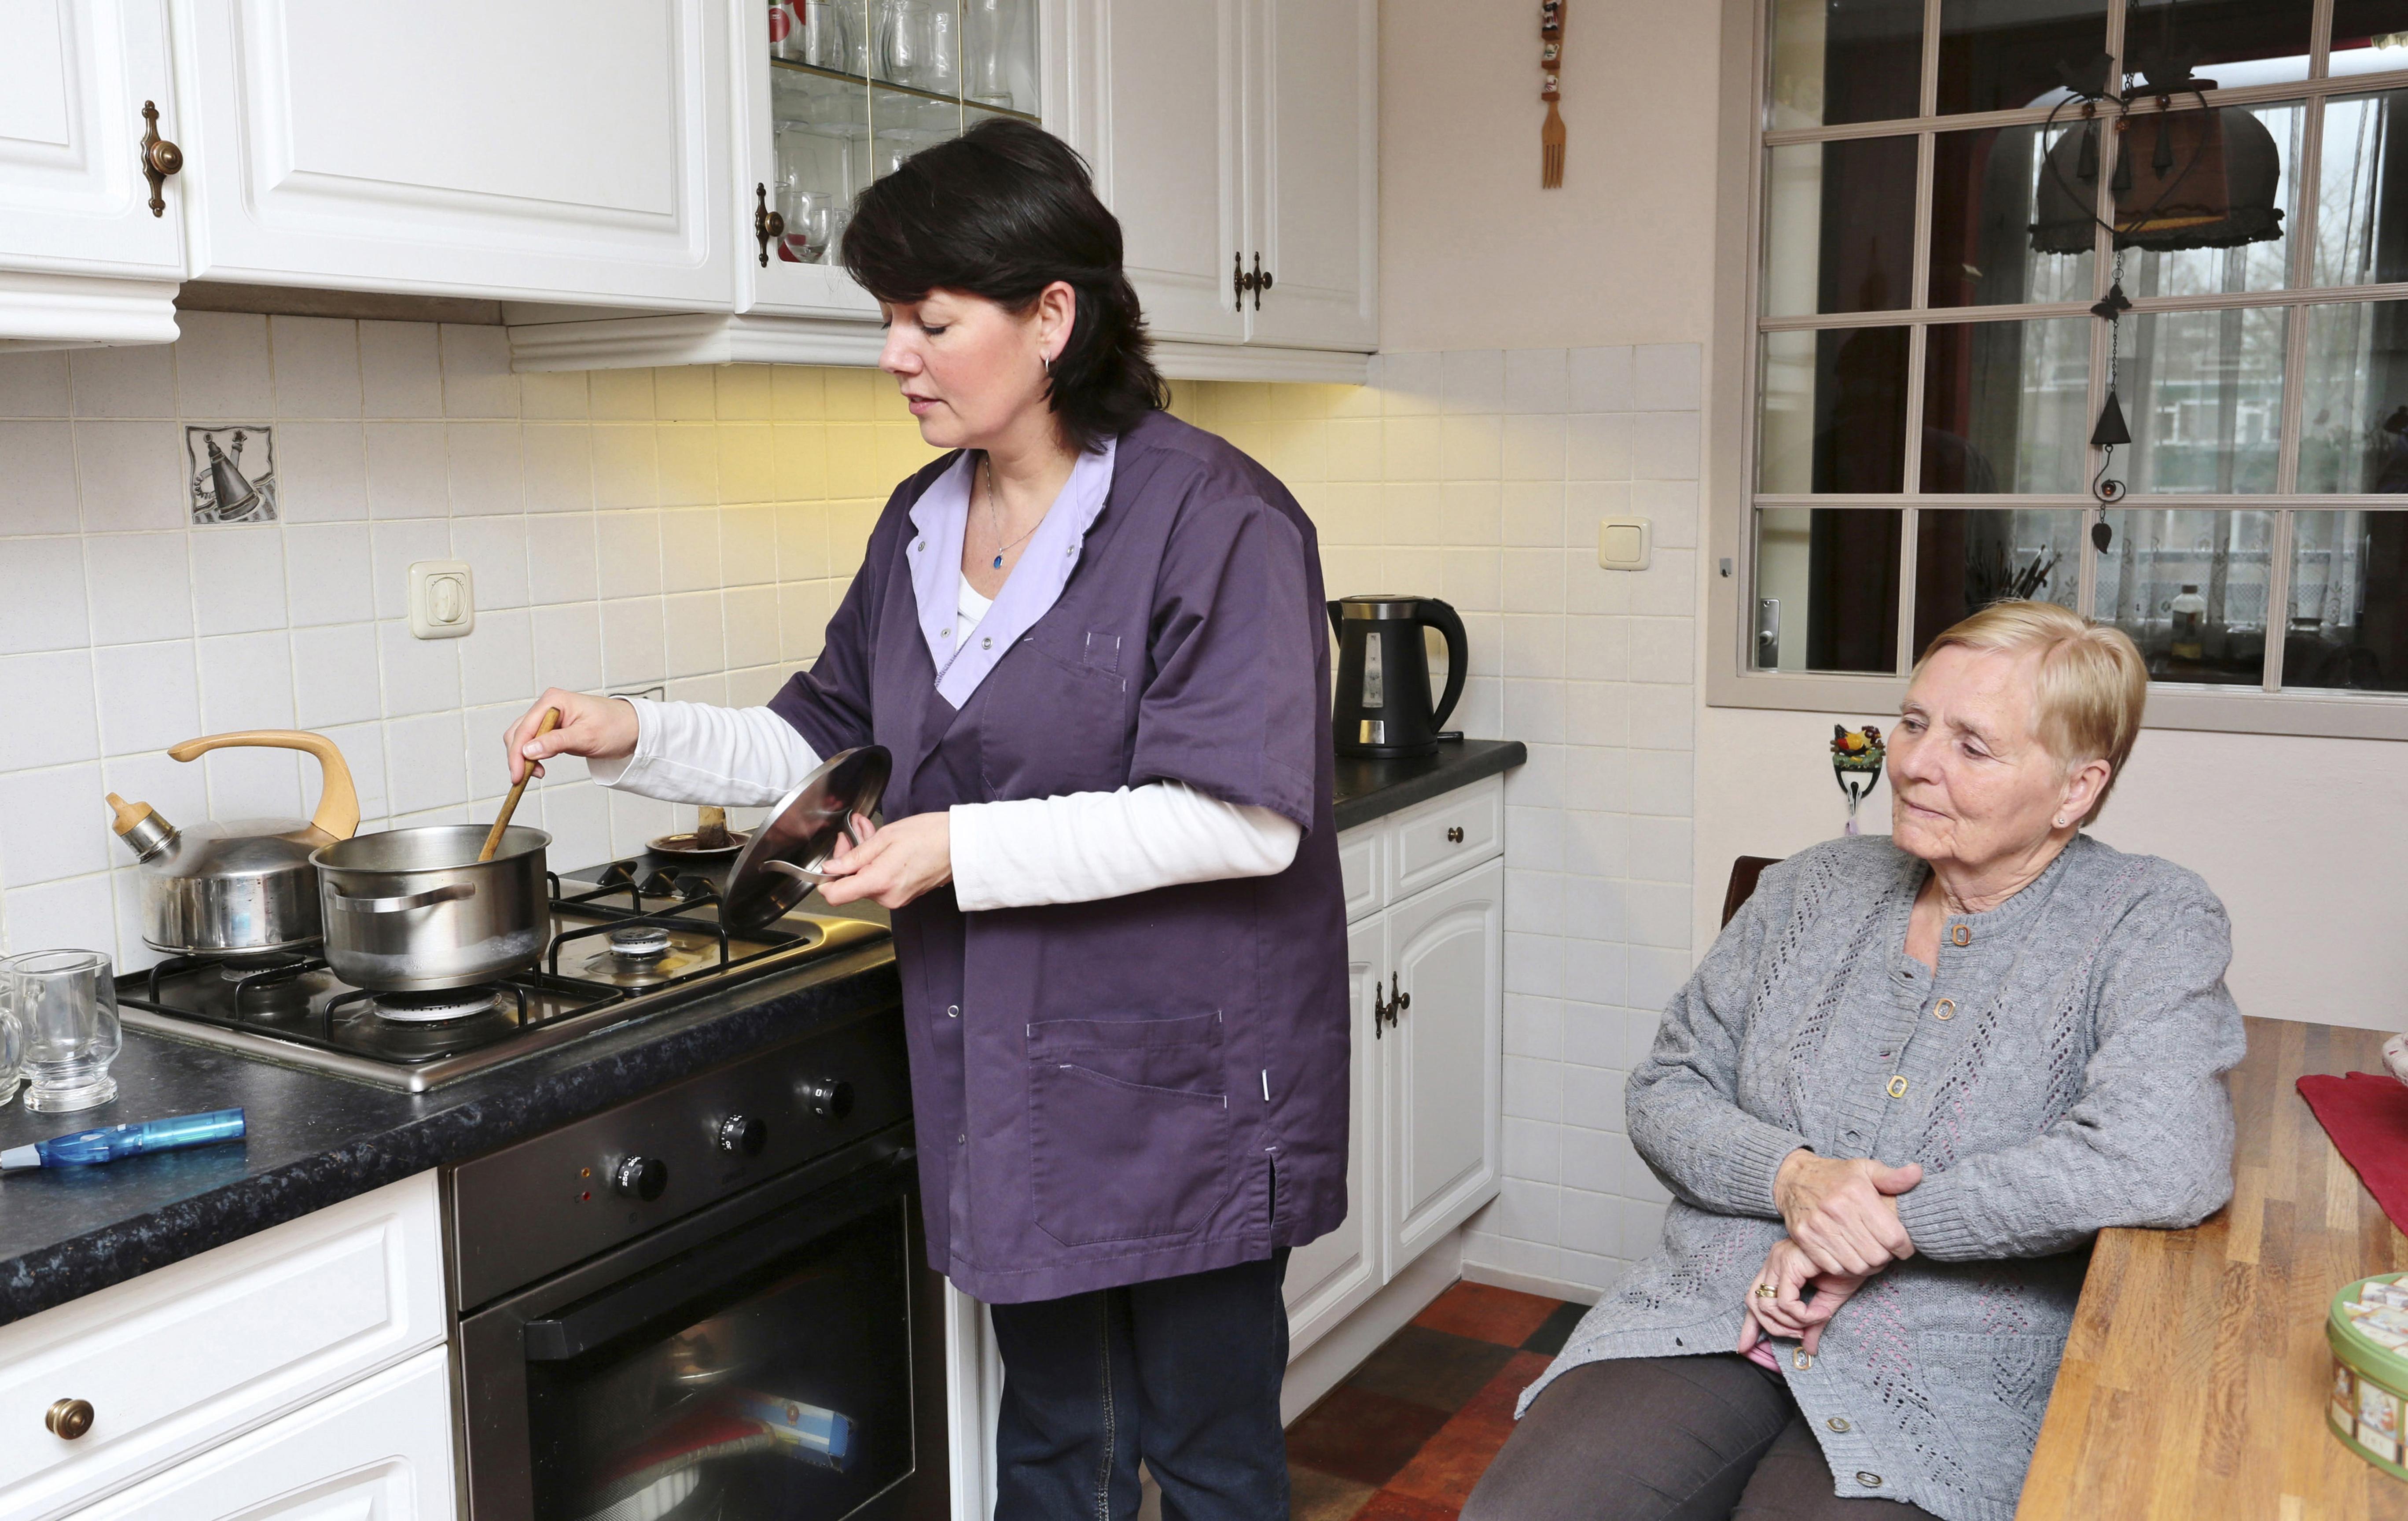 Caregiver making a meal